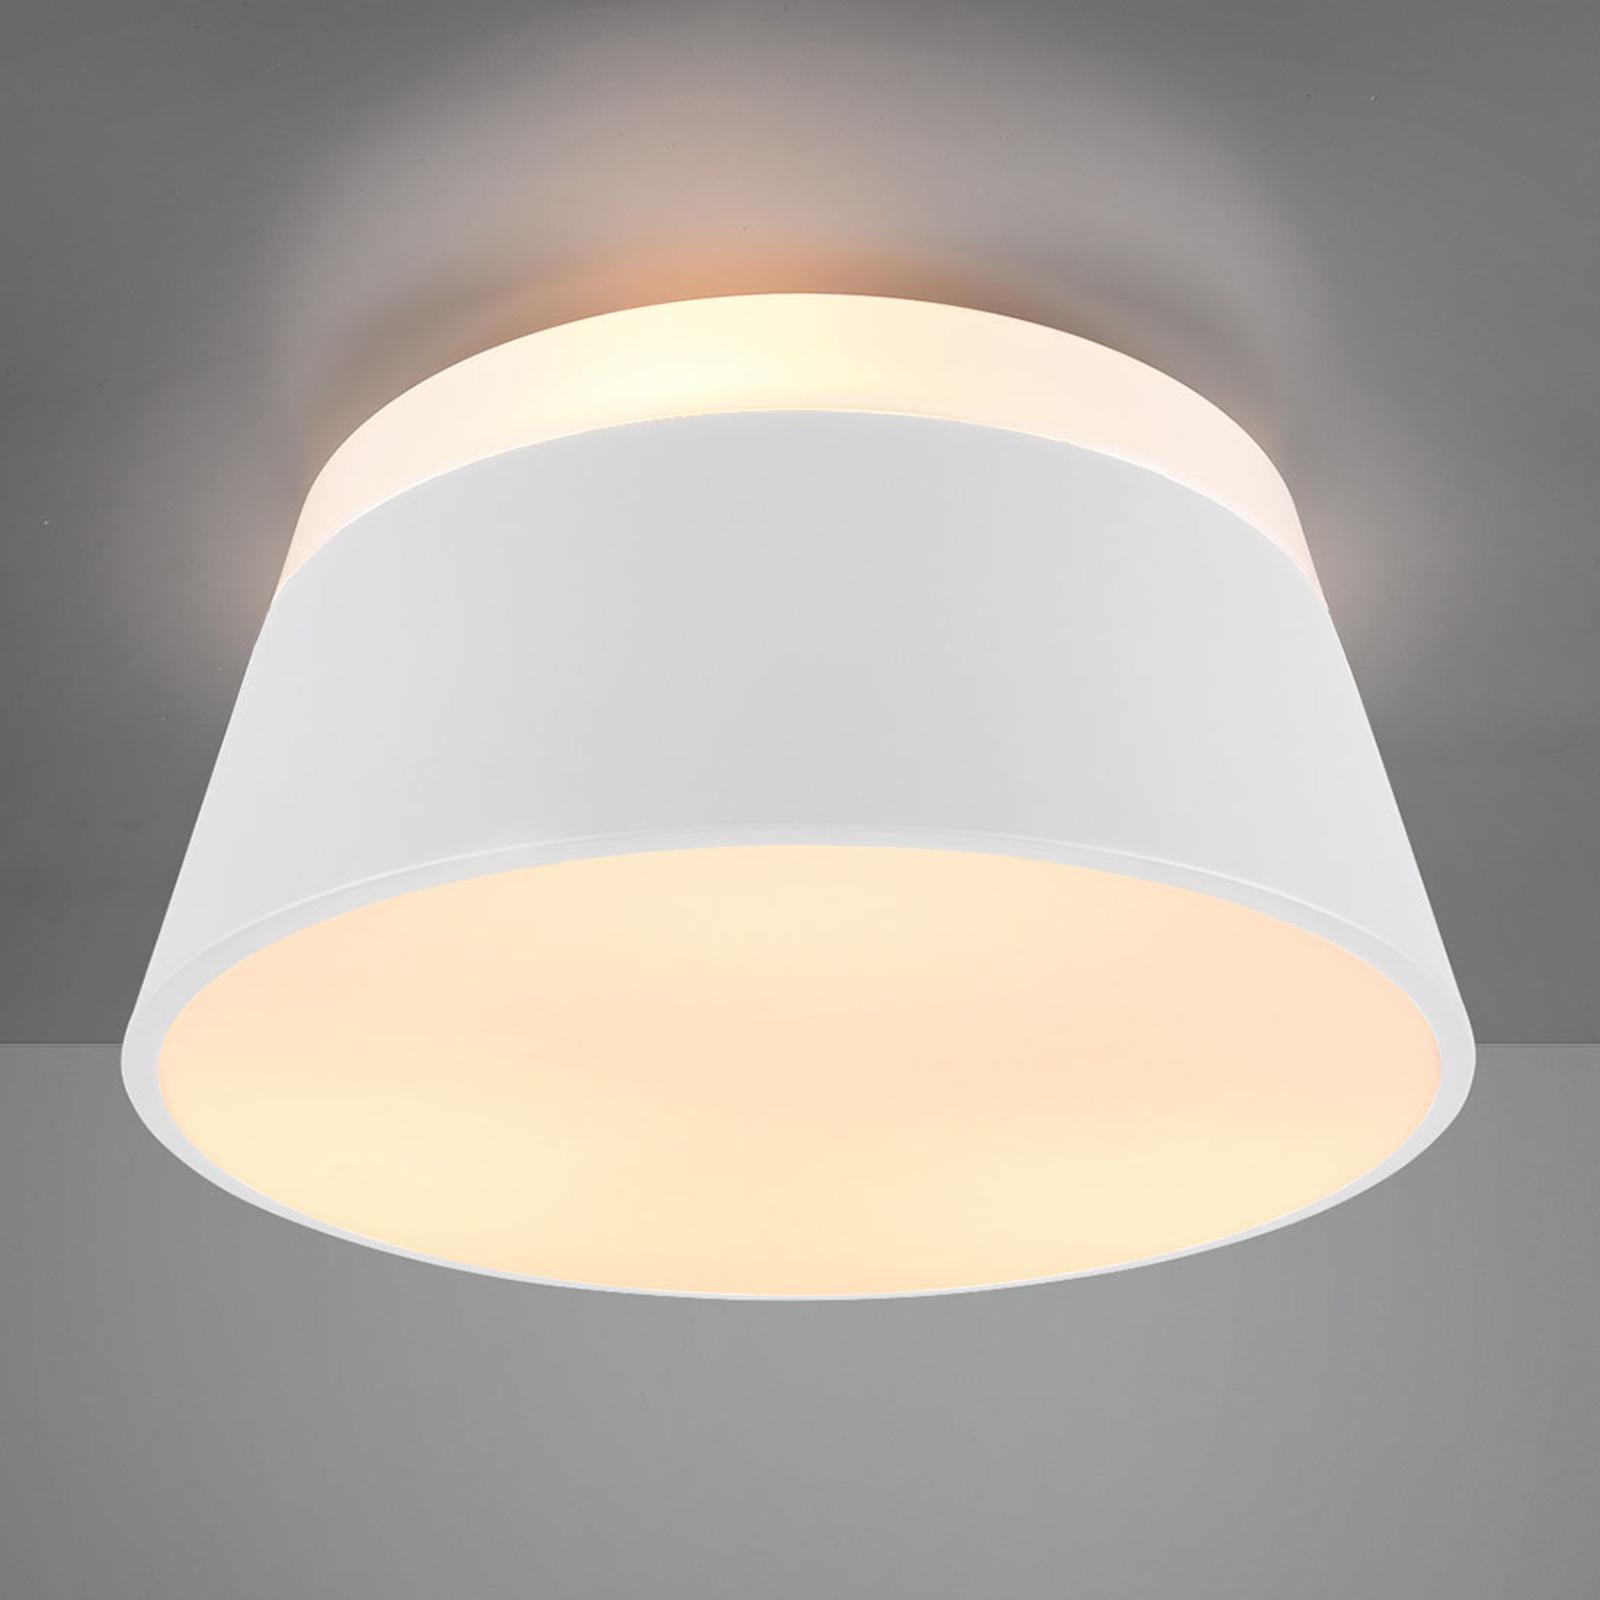 Lampa sufitowa Baroness biała